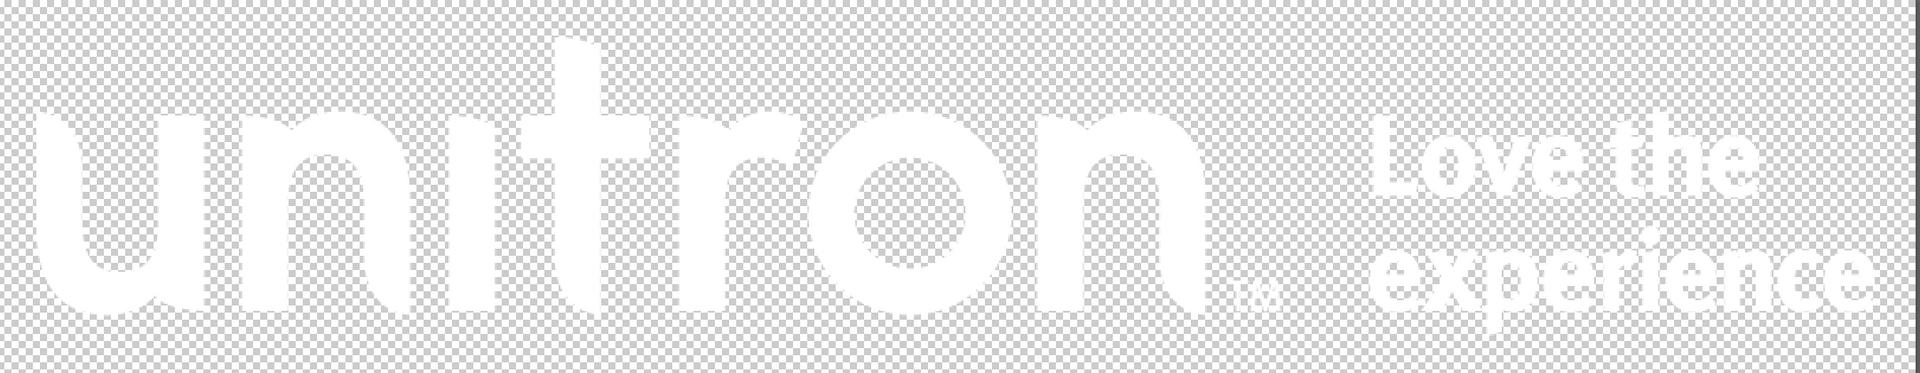 Unitron with tagline - White PNG